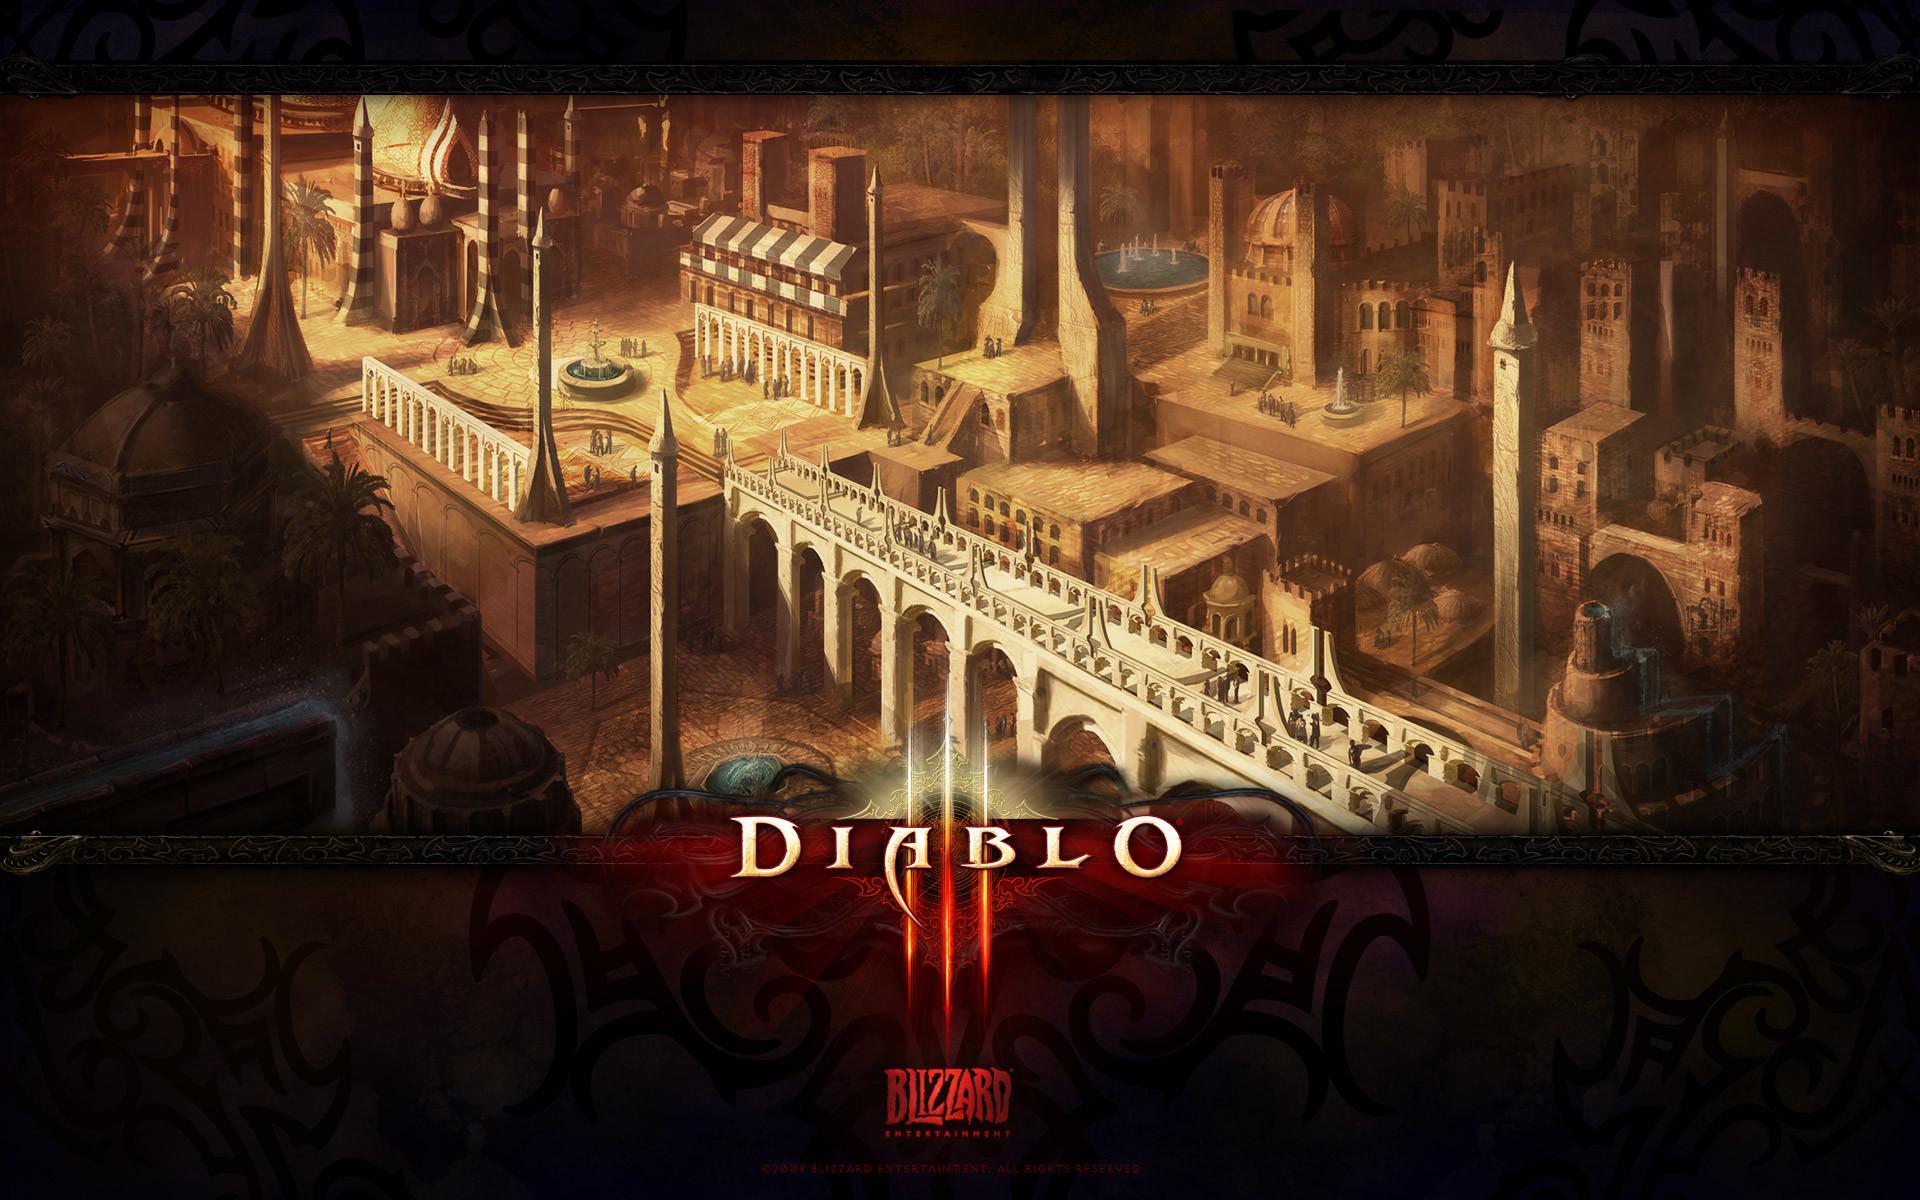 Diablo Wallpapers x Wallpaper | HD Wallpapers | Pinterest | Wallpaper and  Wallpaper backgrounds